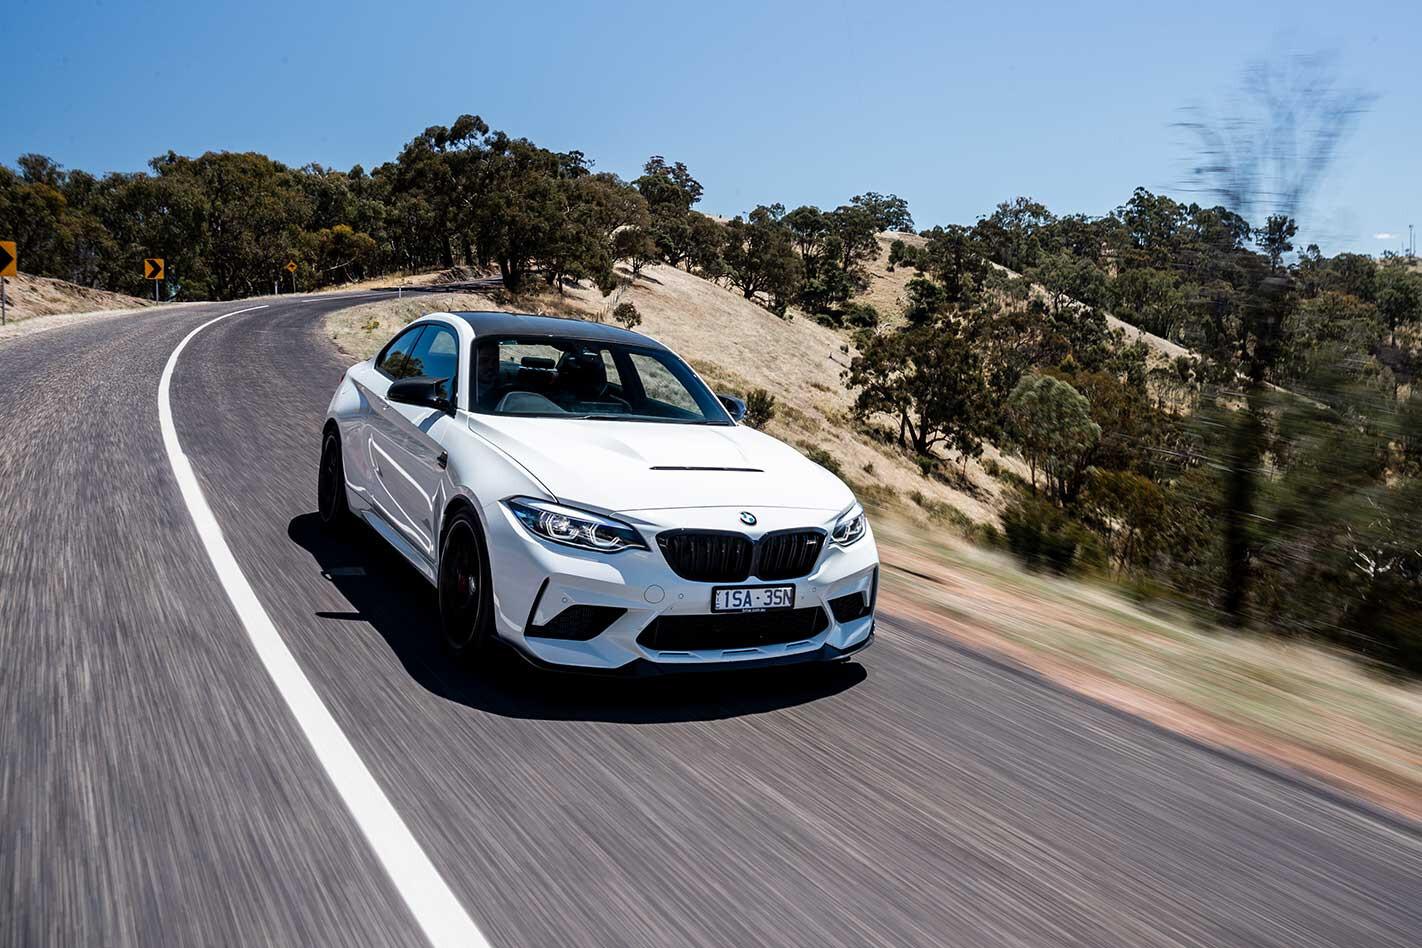 2021 BMW M2 CS review